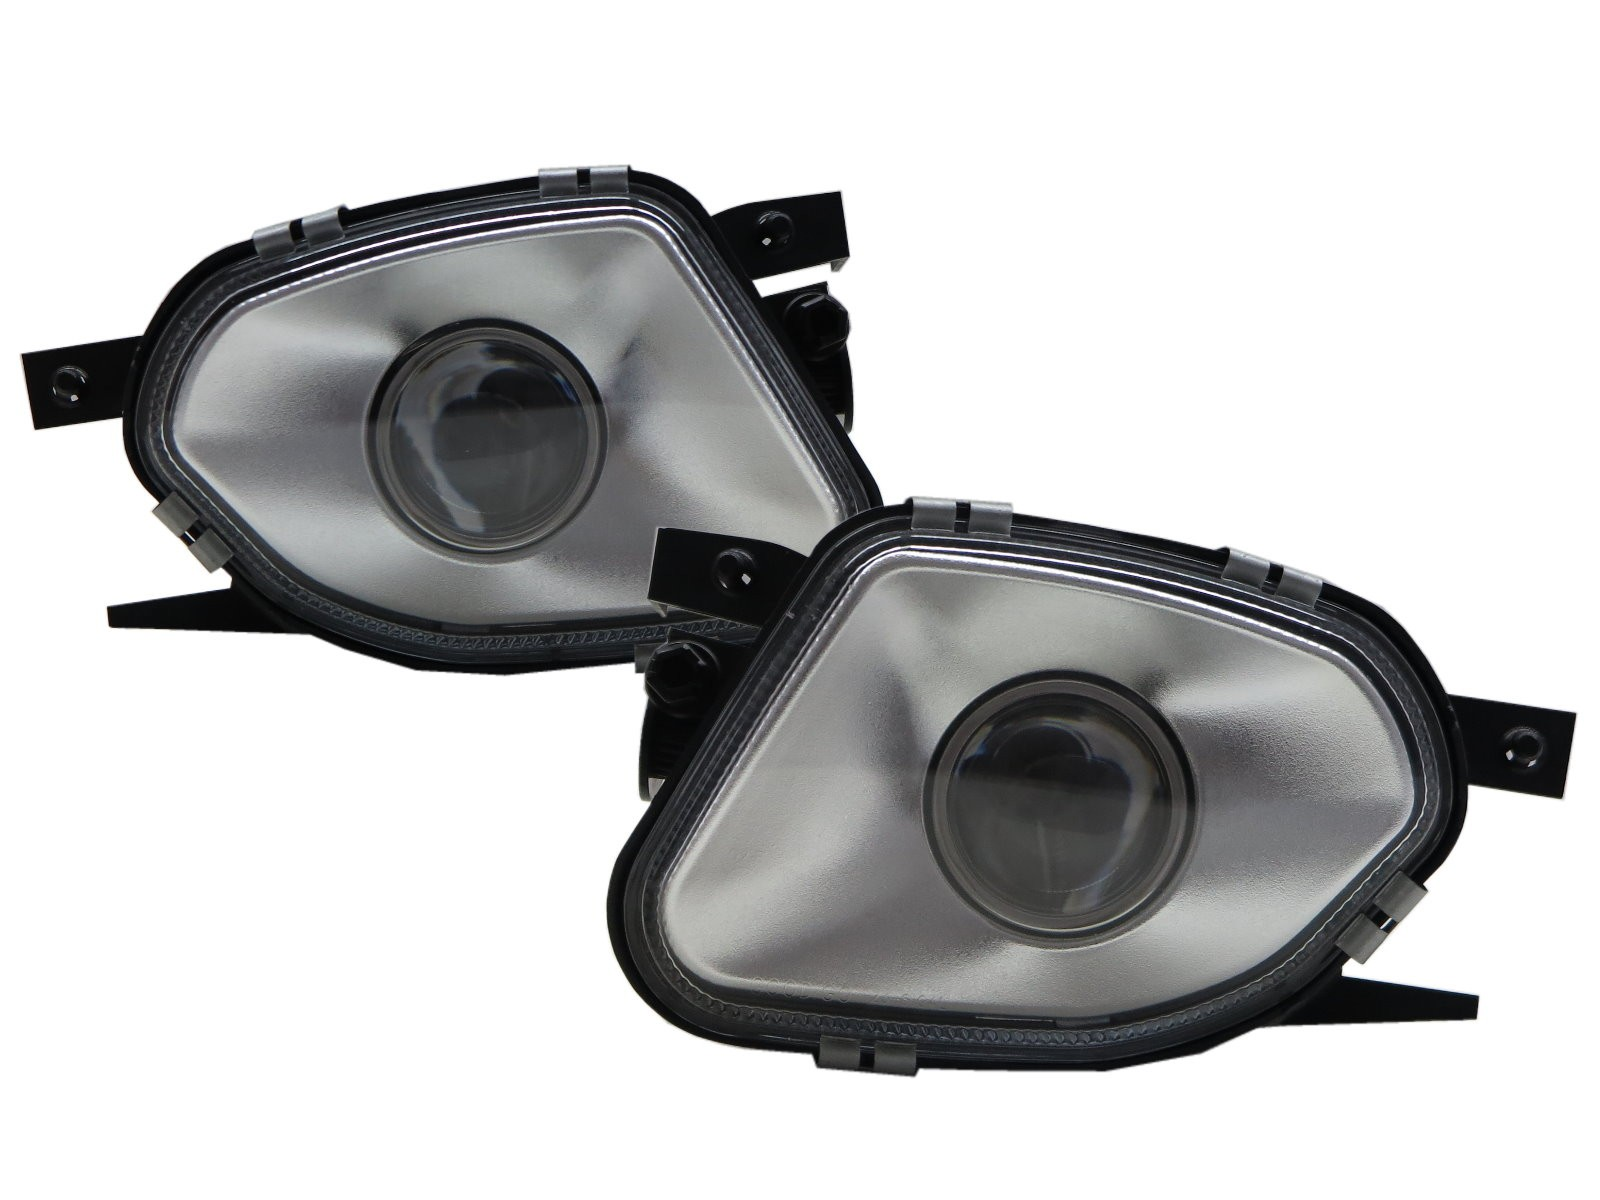 CrazyTheGod E-CLASS W211/S211 2002-2006 Sedan 4D Projector Fog Light Lamp Silver for Mercedes-Benz